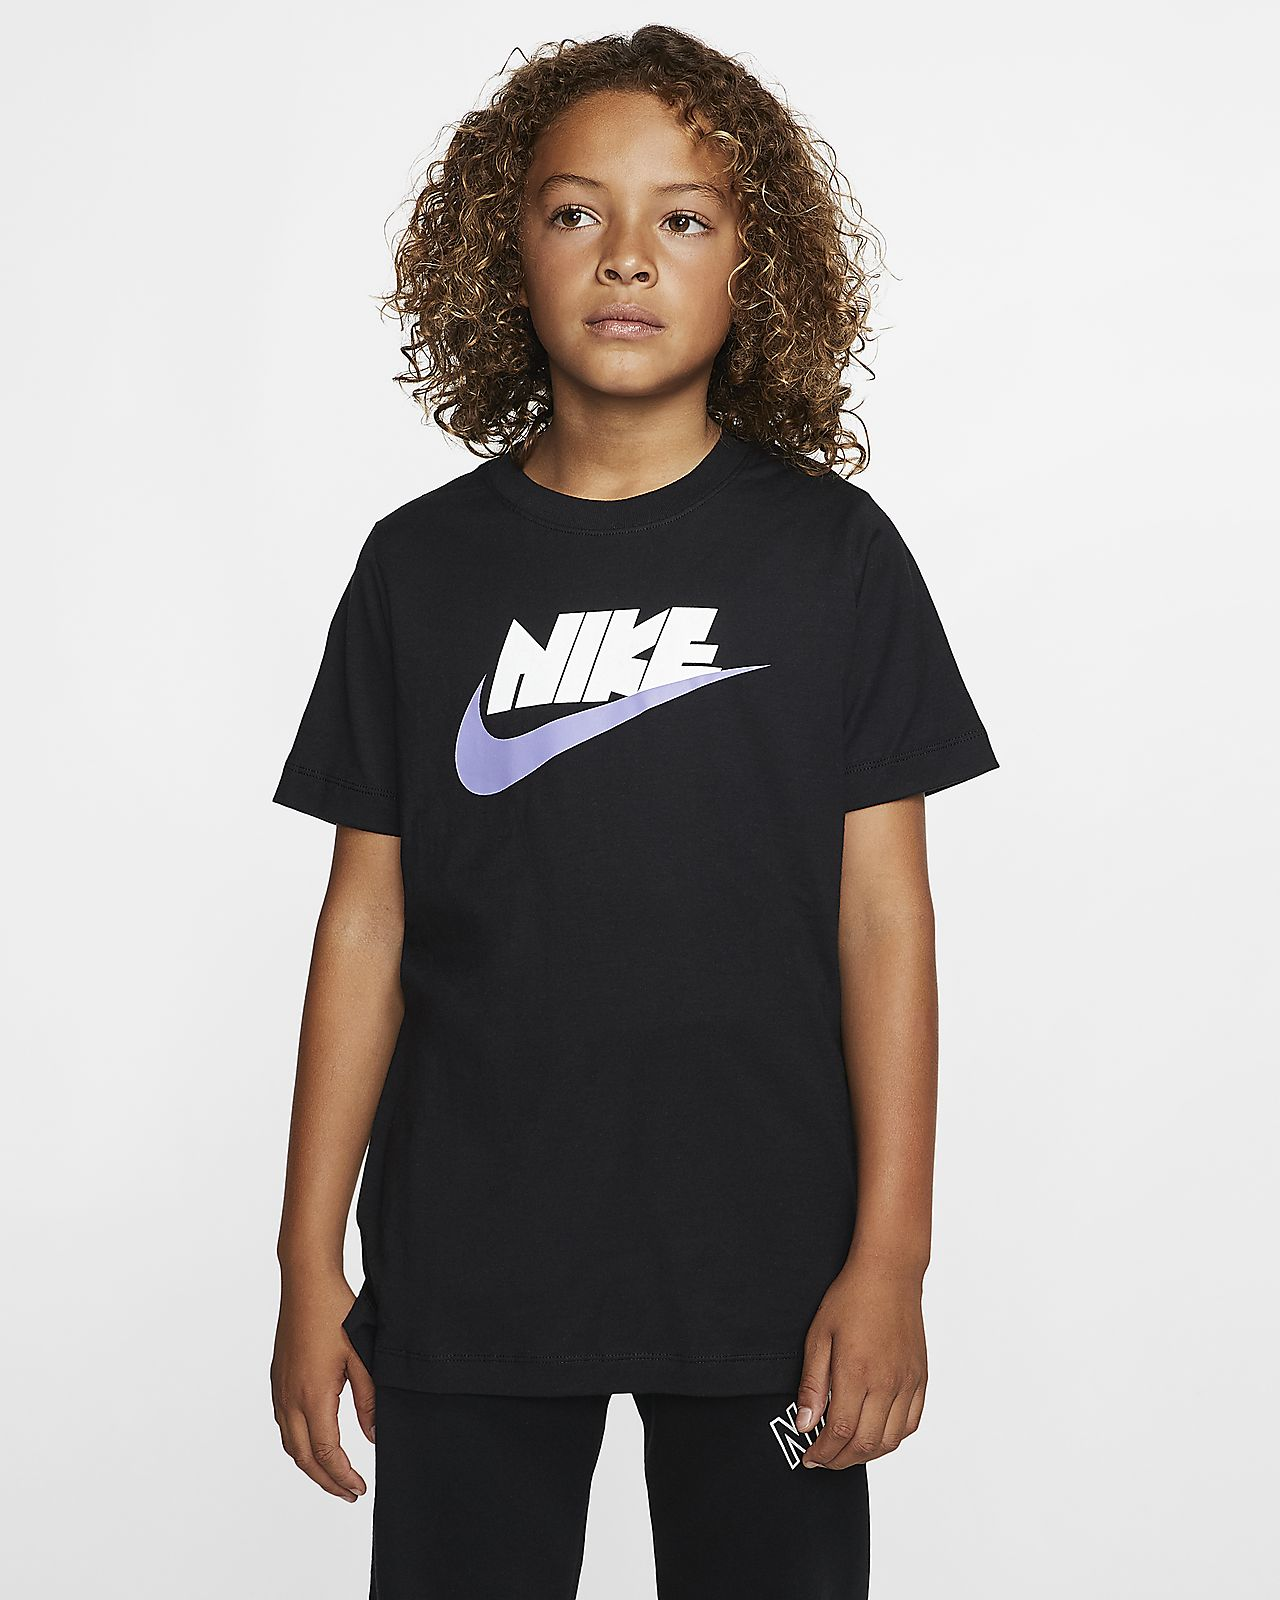 nike shirts for boys